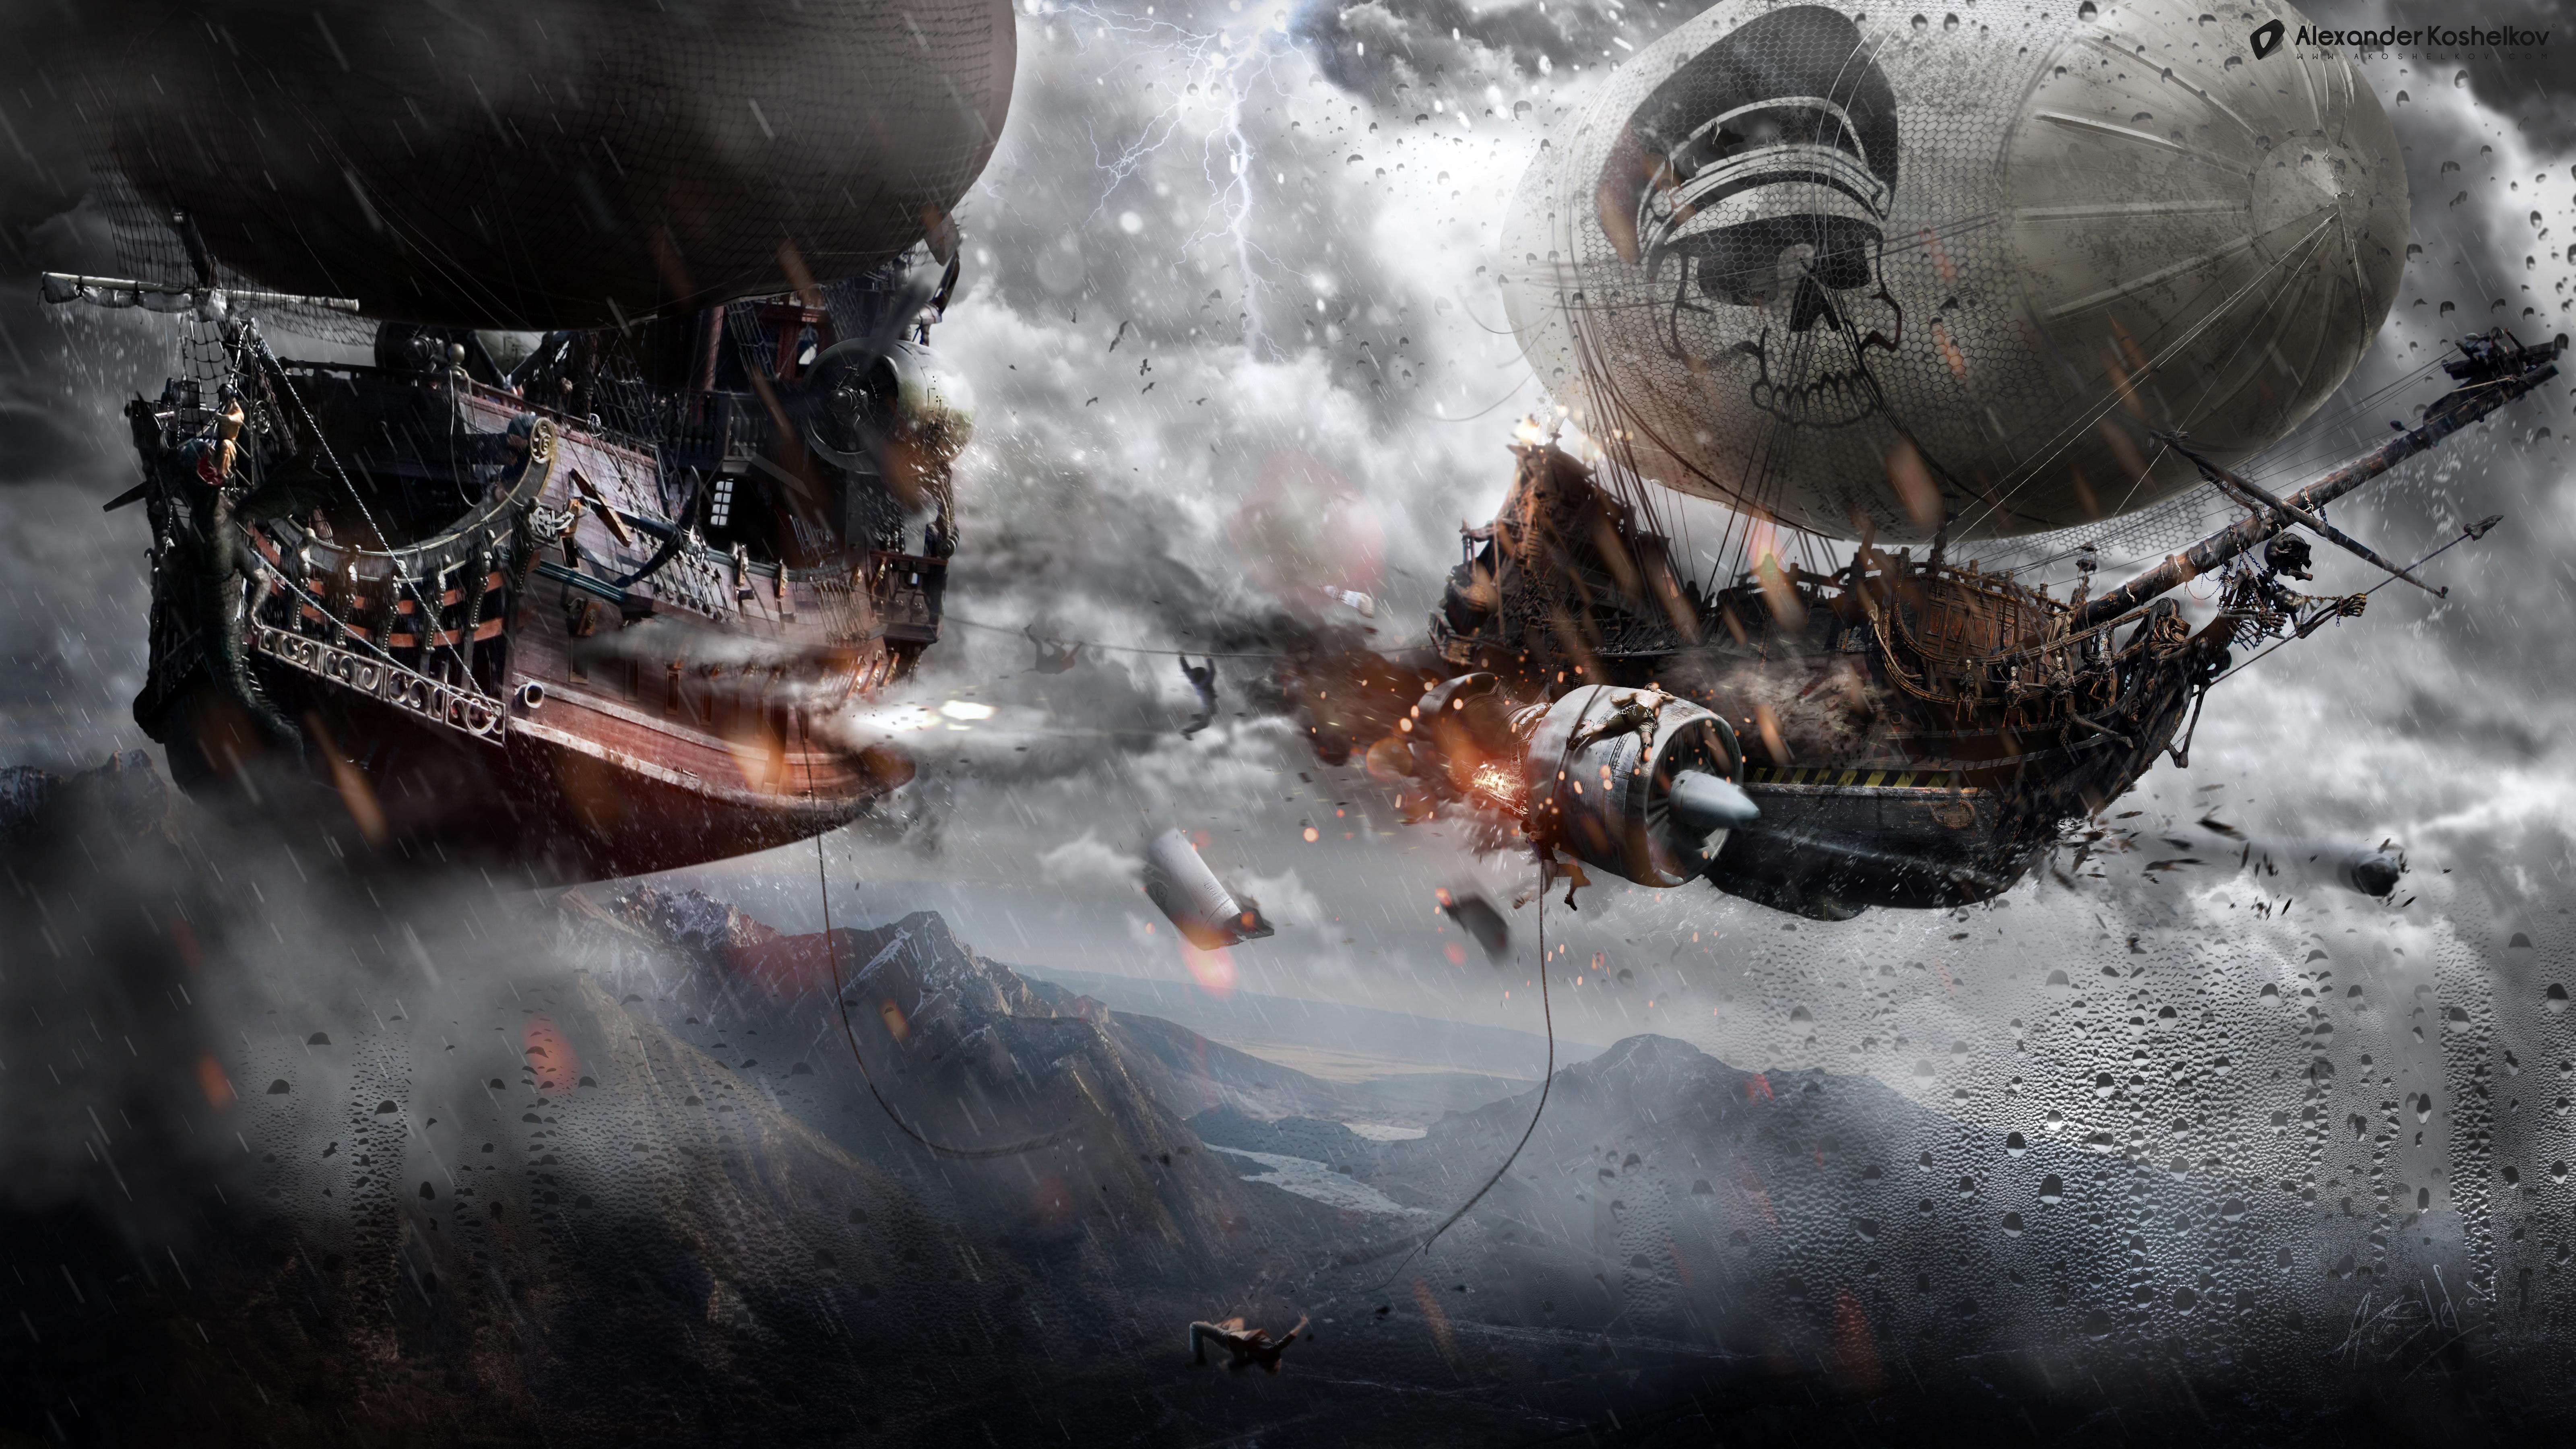 Airship Of Doom by Koshelkov on DeviantArt